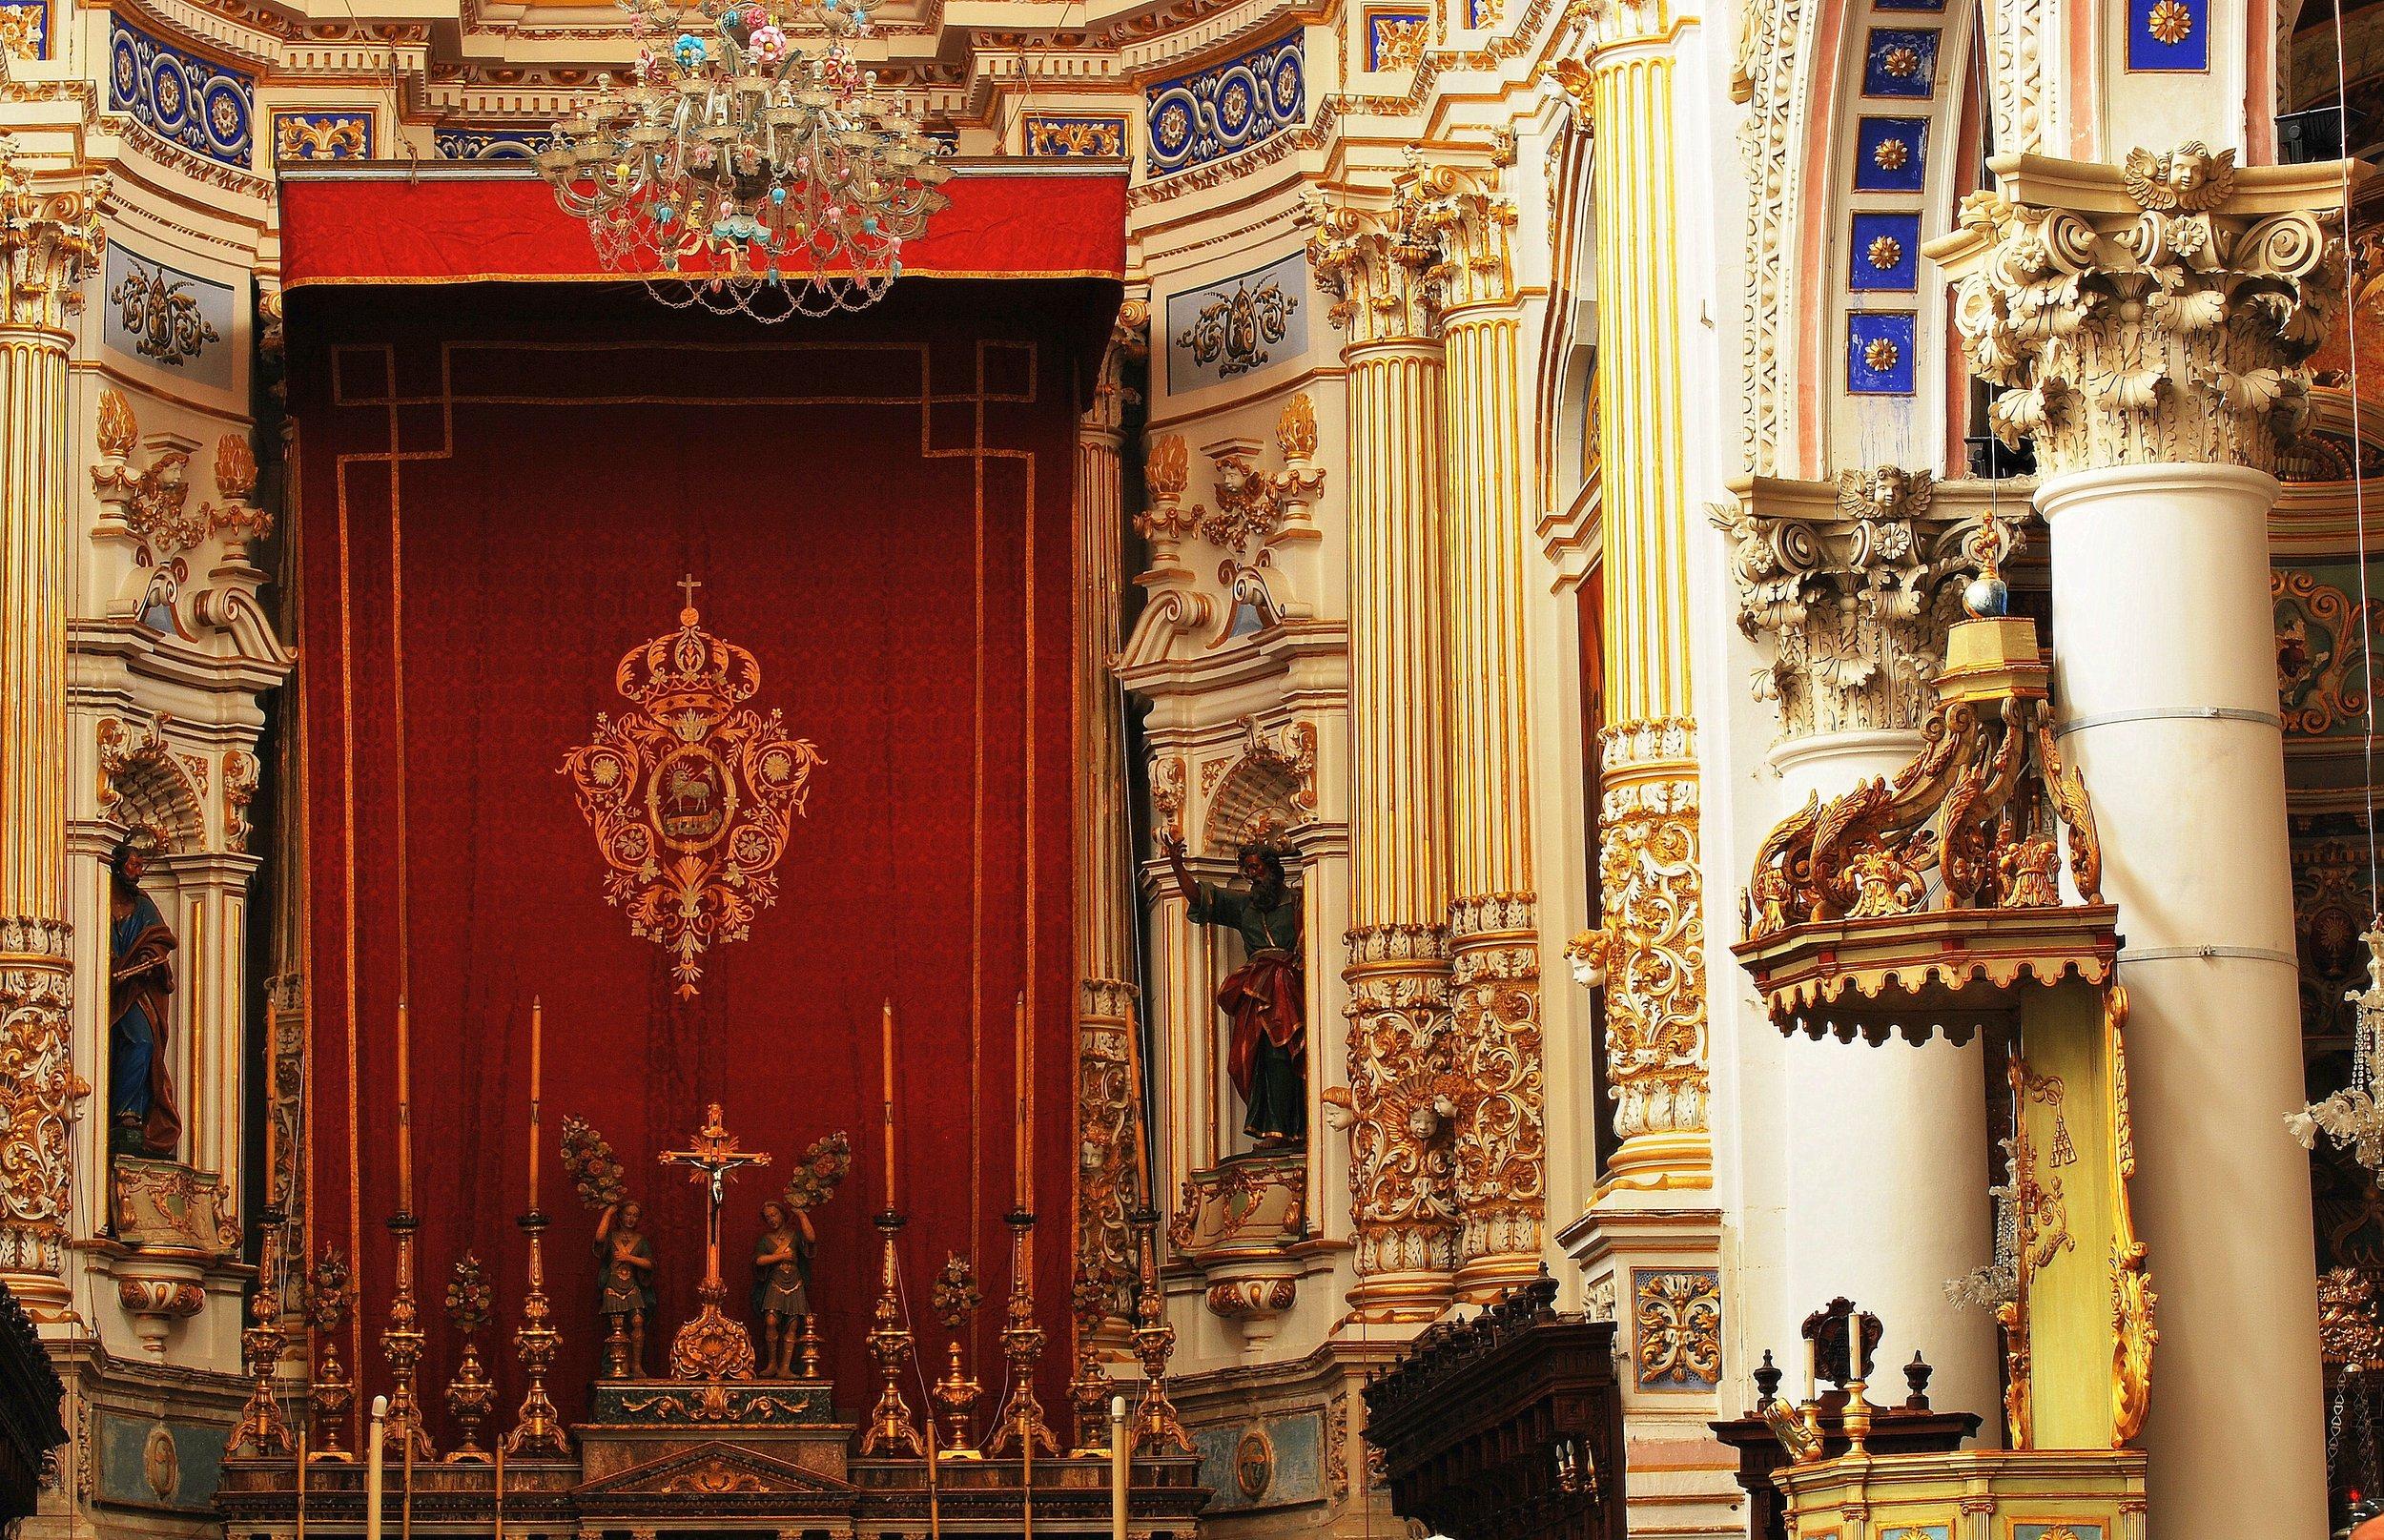 A baroque church in Sicily